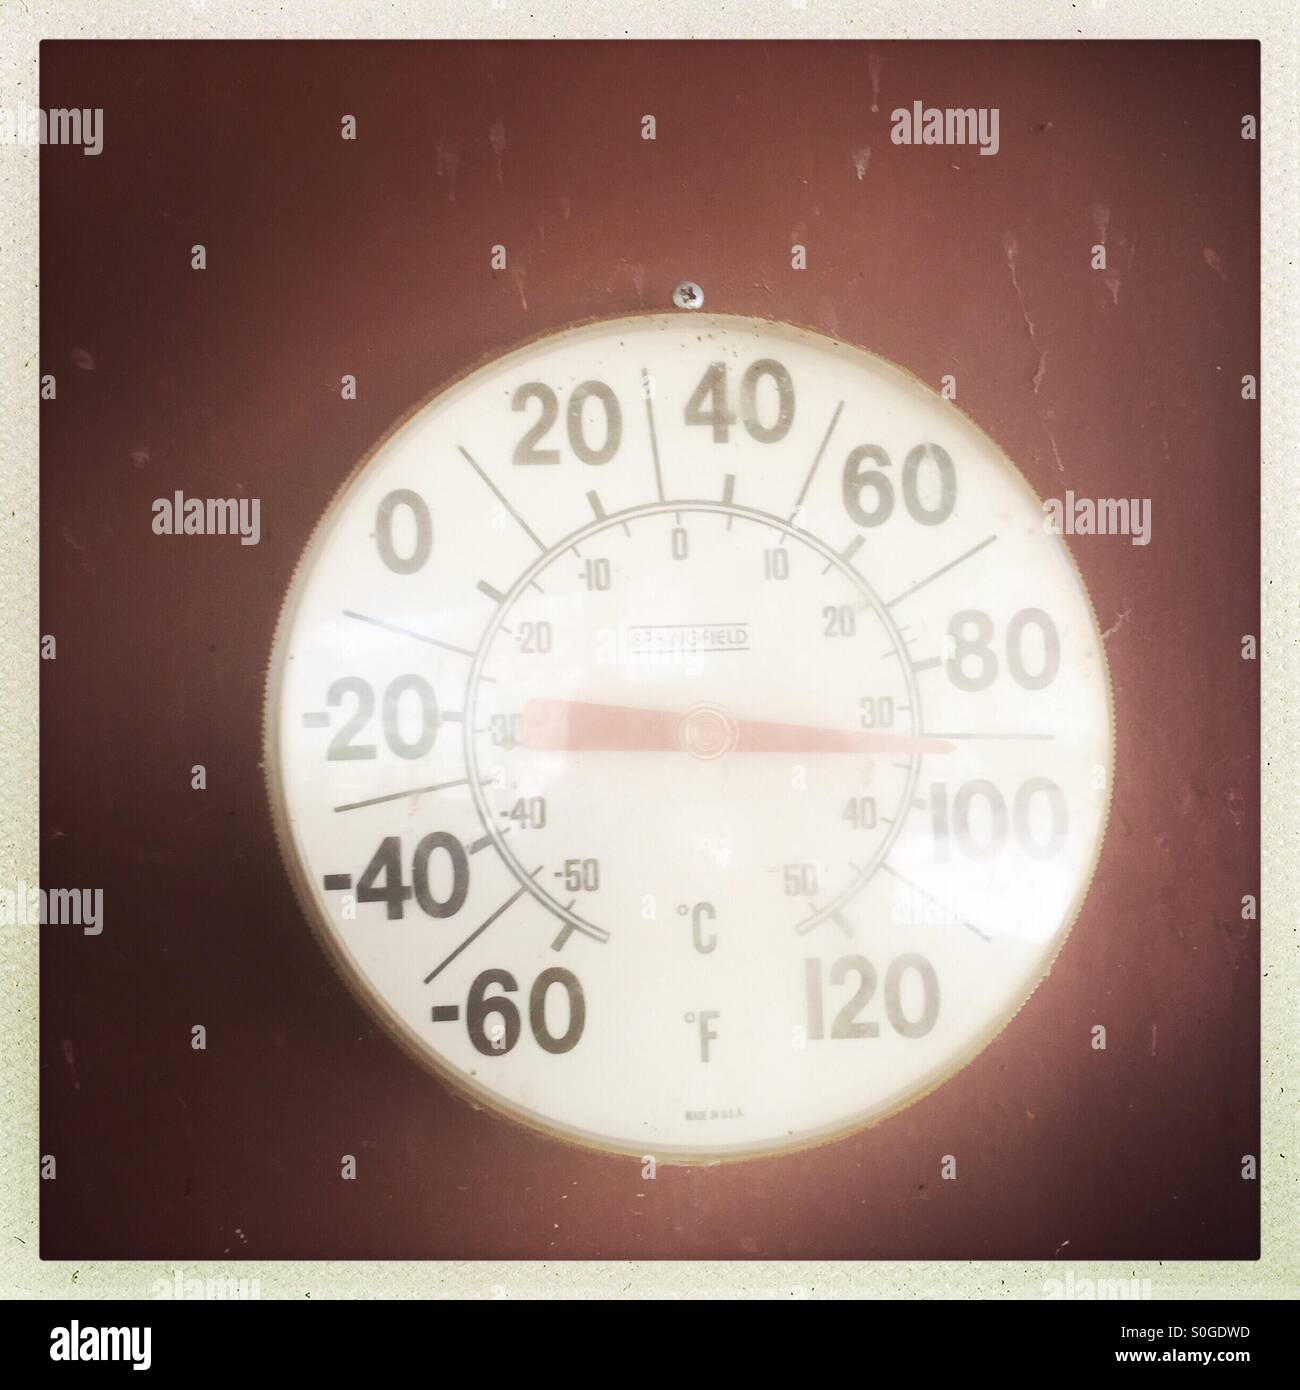 Un indicador de temperatura. Imagen De Stock